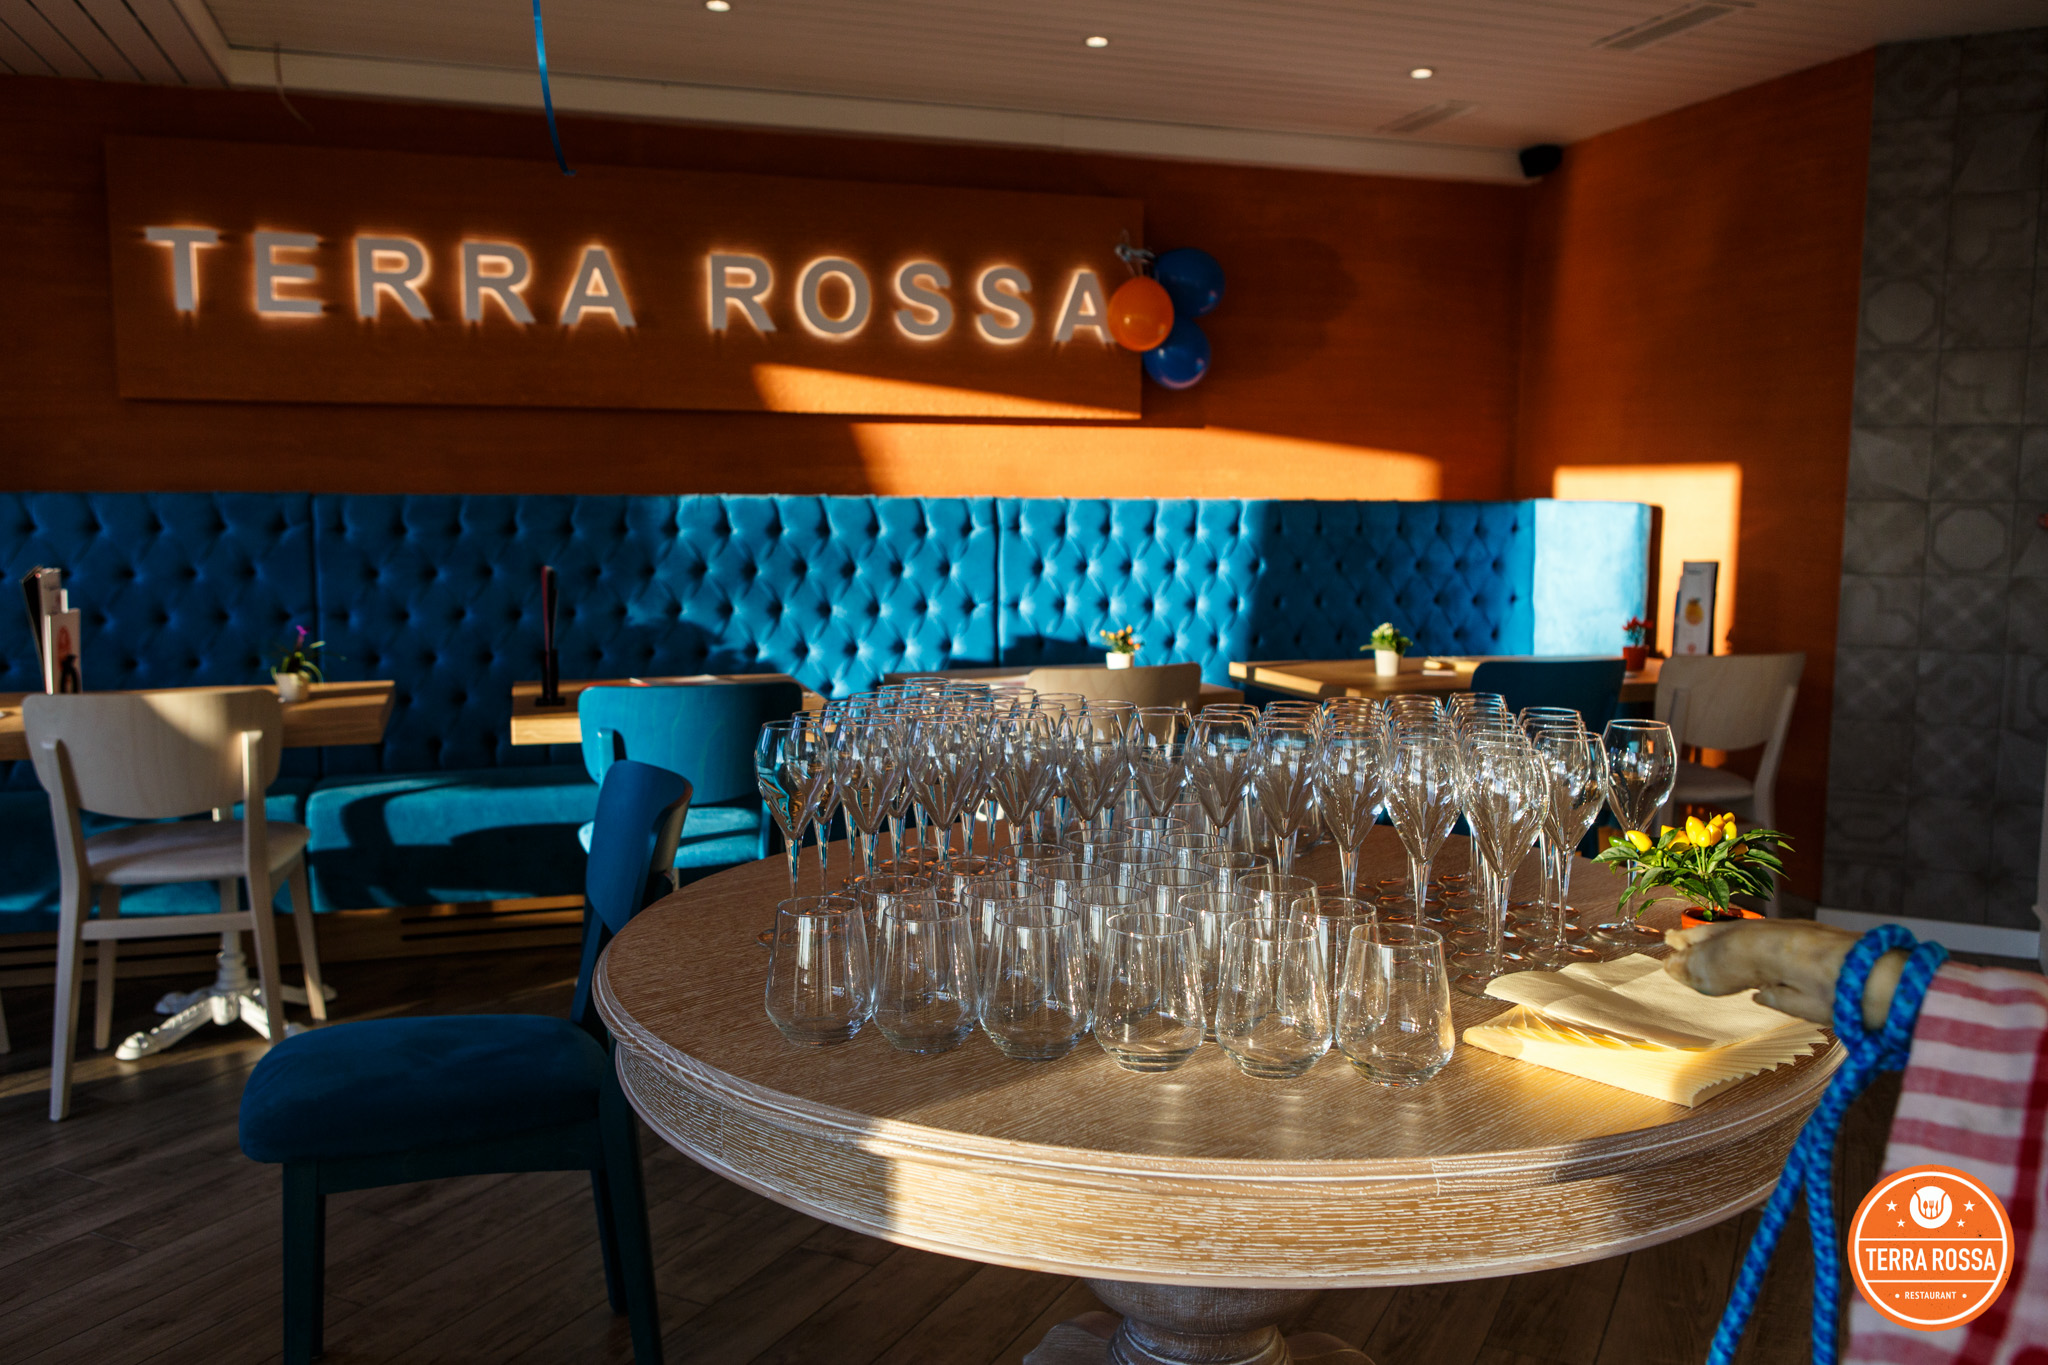 Terra-Rossa-opening-1